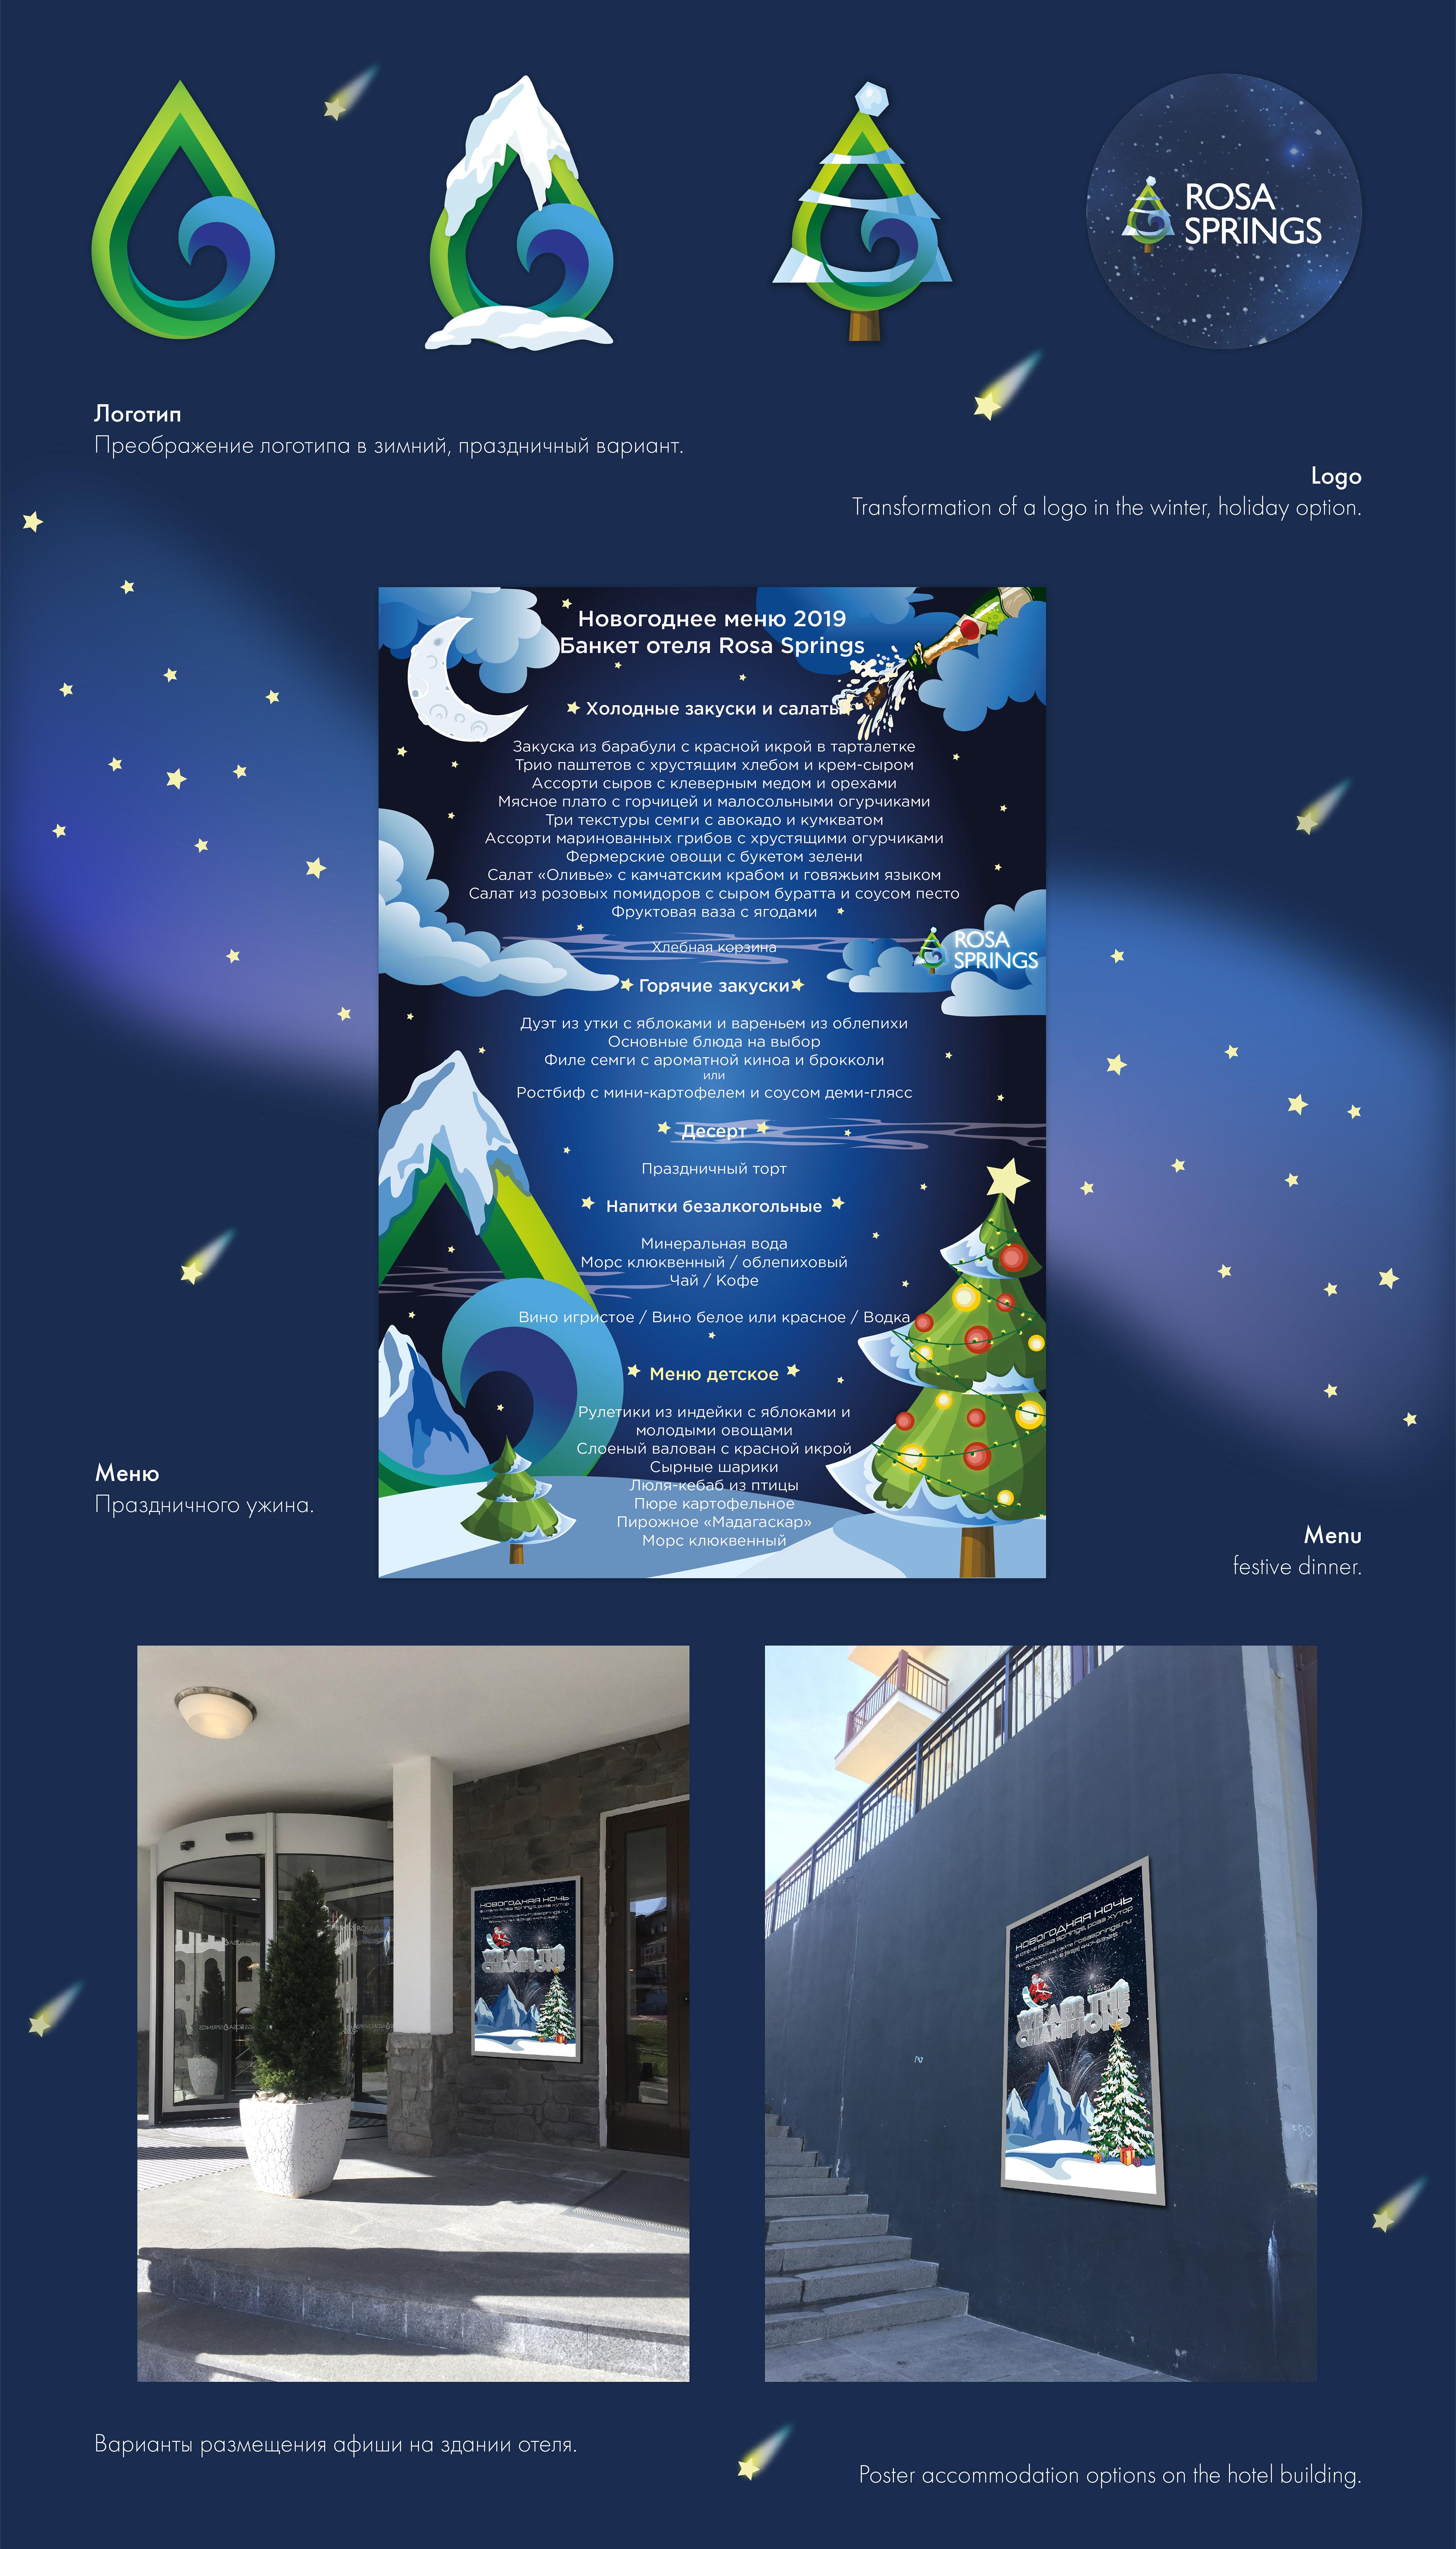 Natalya Nova - New Year's Eve poster